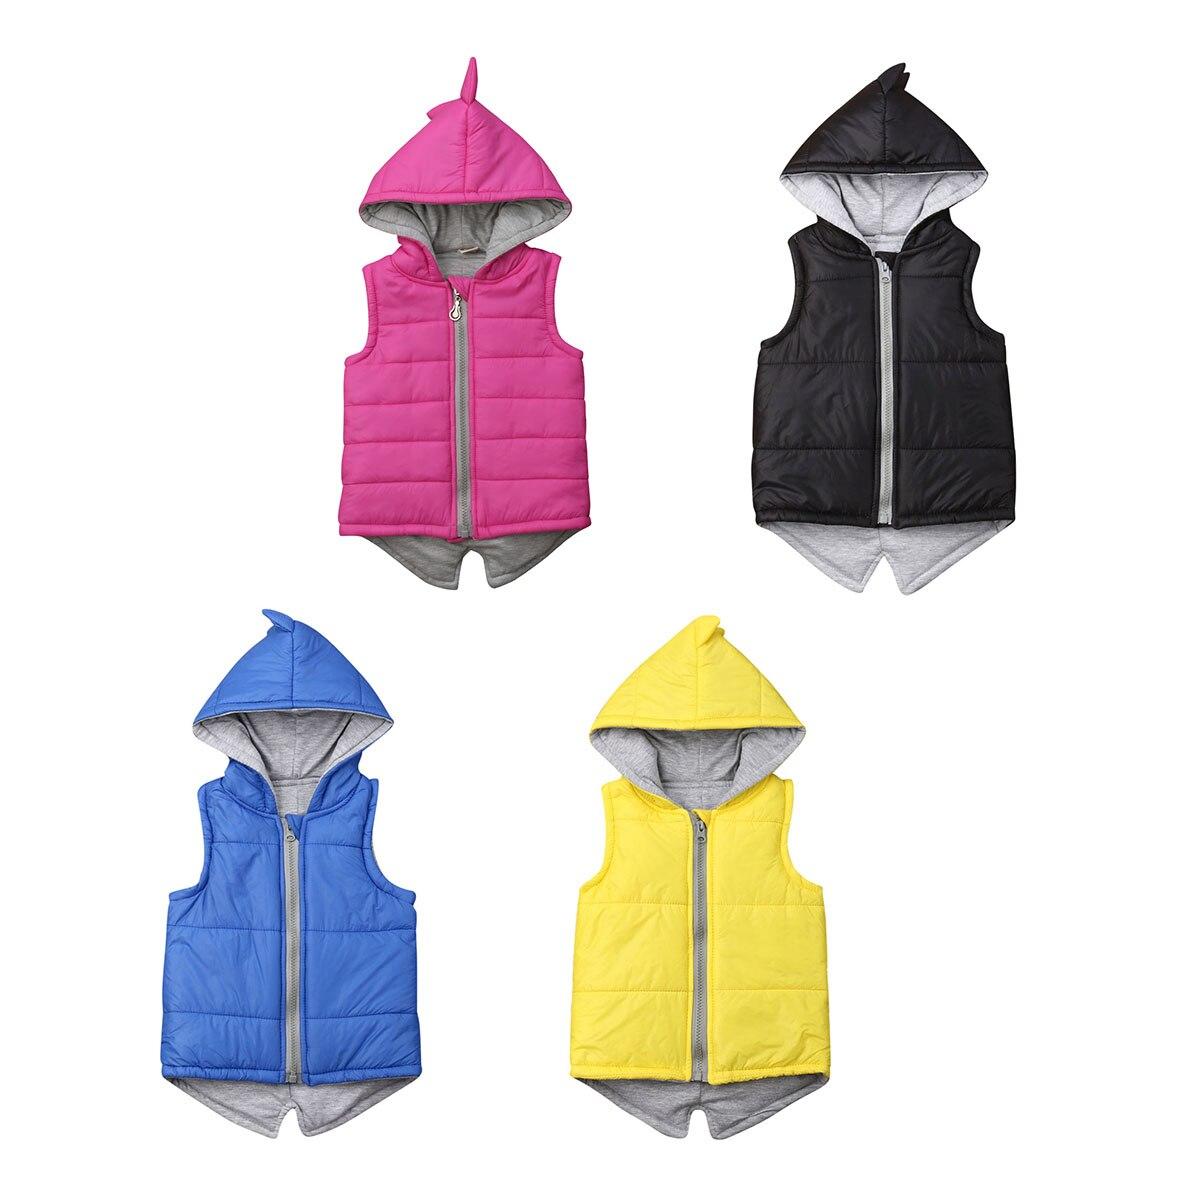 Winter Infant Kids Baby Girls Dinosaur Vest Zip Hooded Jacket Coat Tops Outerwear Pink Hoodies 6M-7T